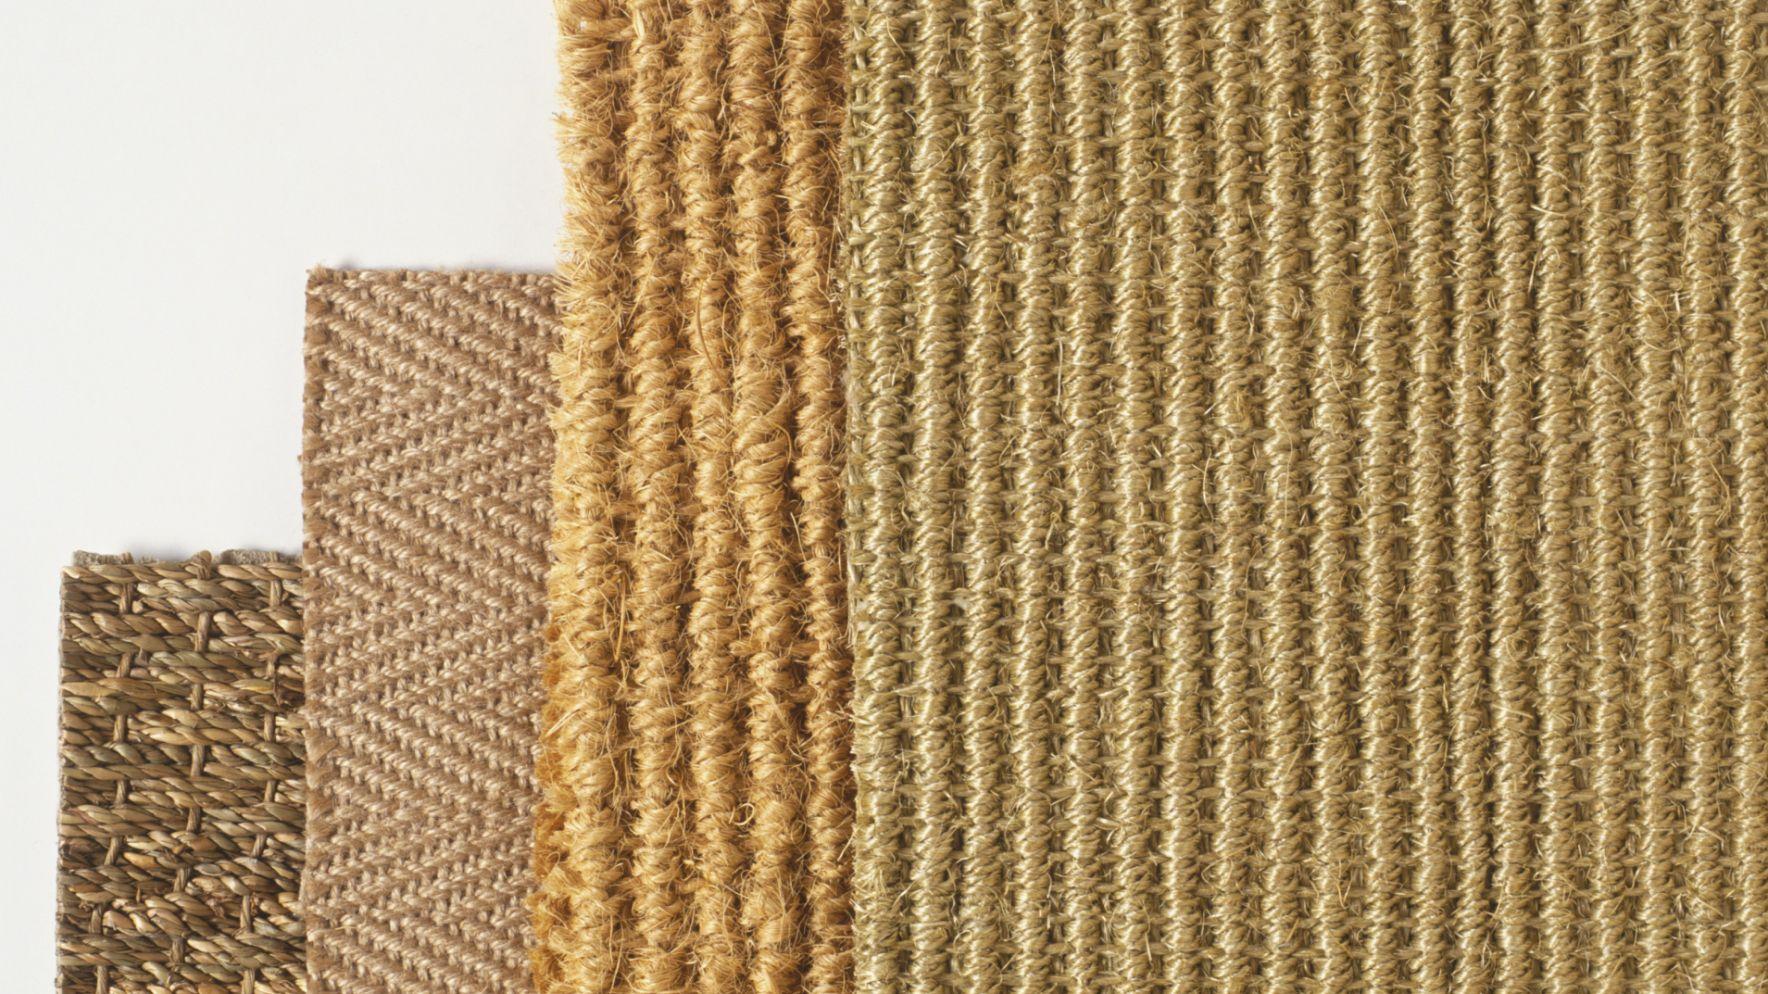 Natural Carpet Care Tips